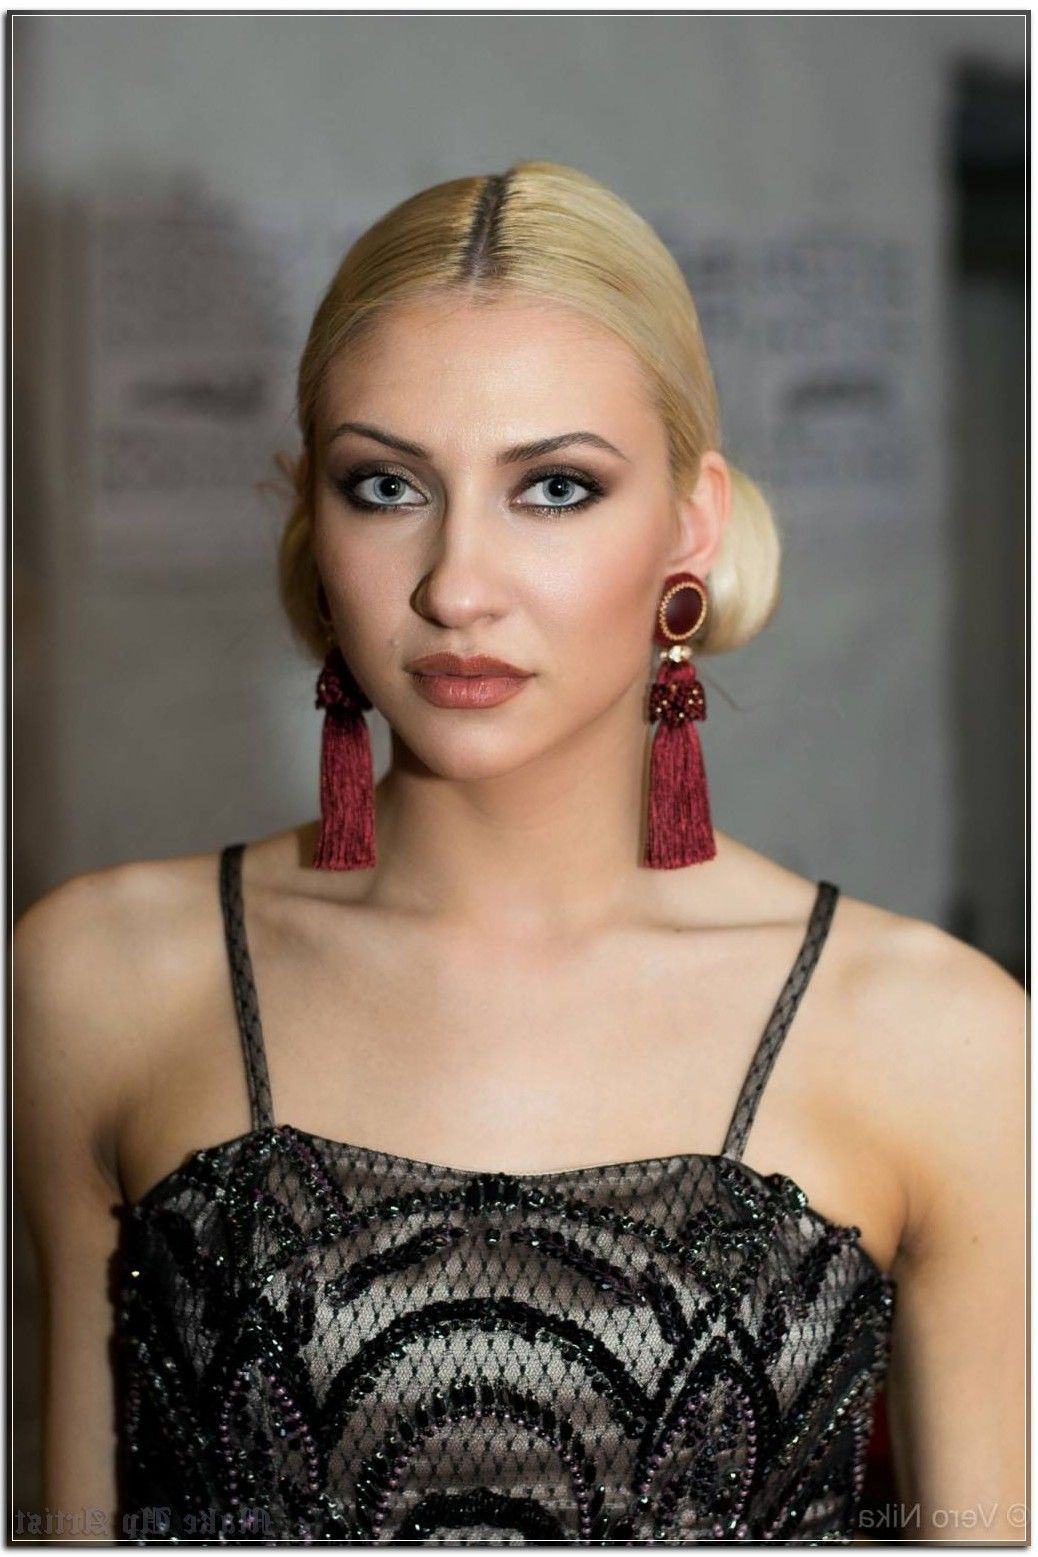 Extreme Make Up Artist